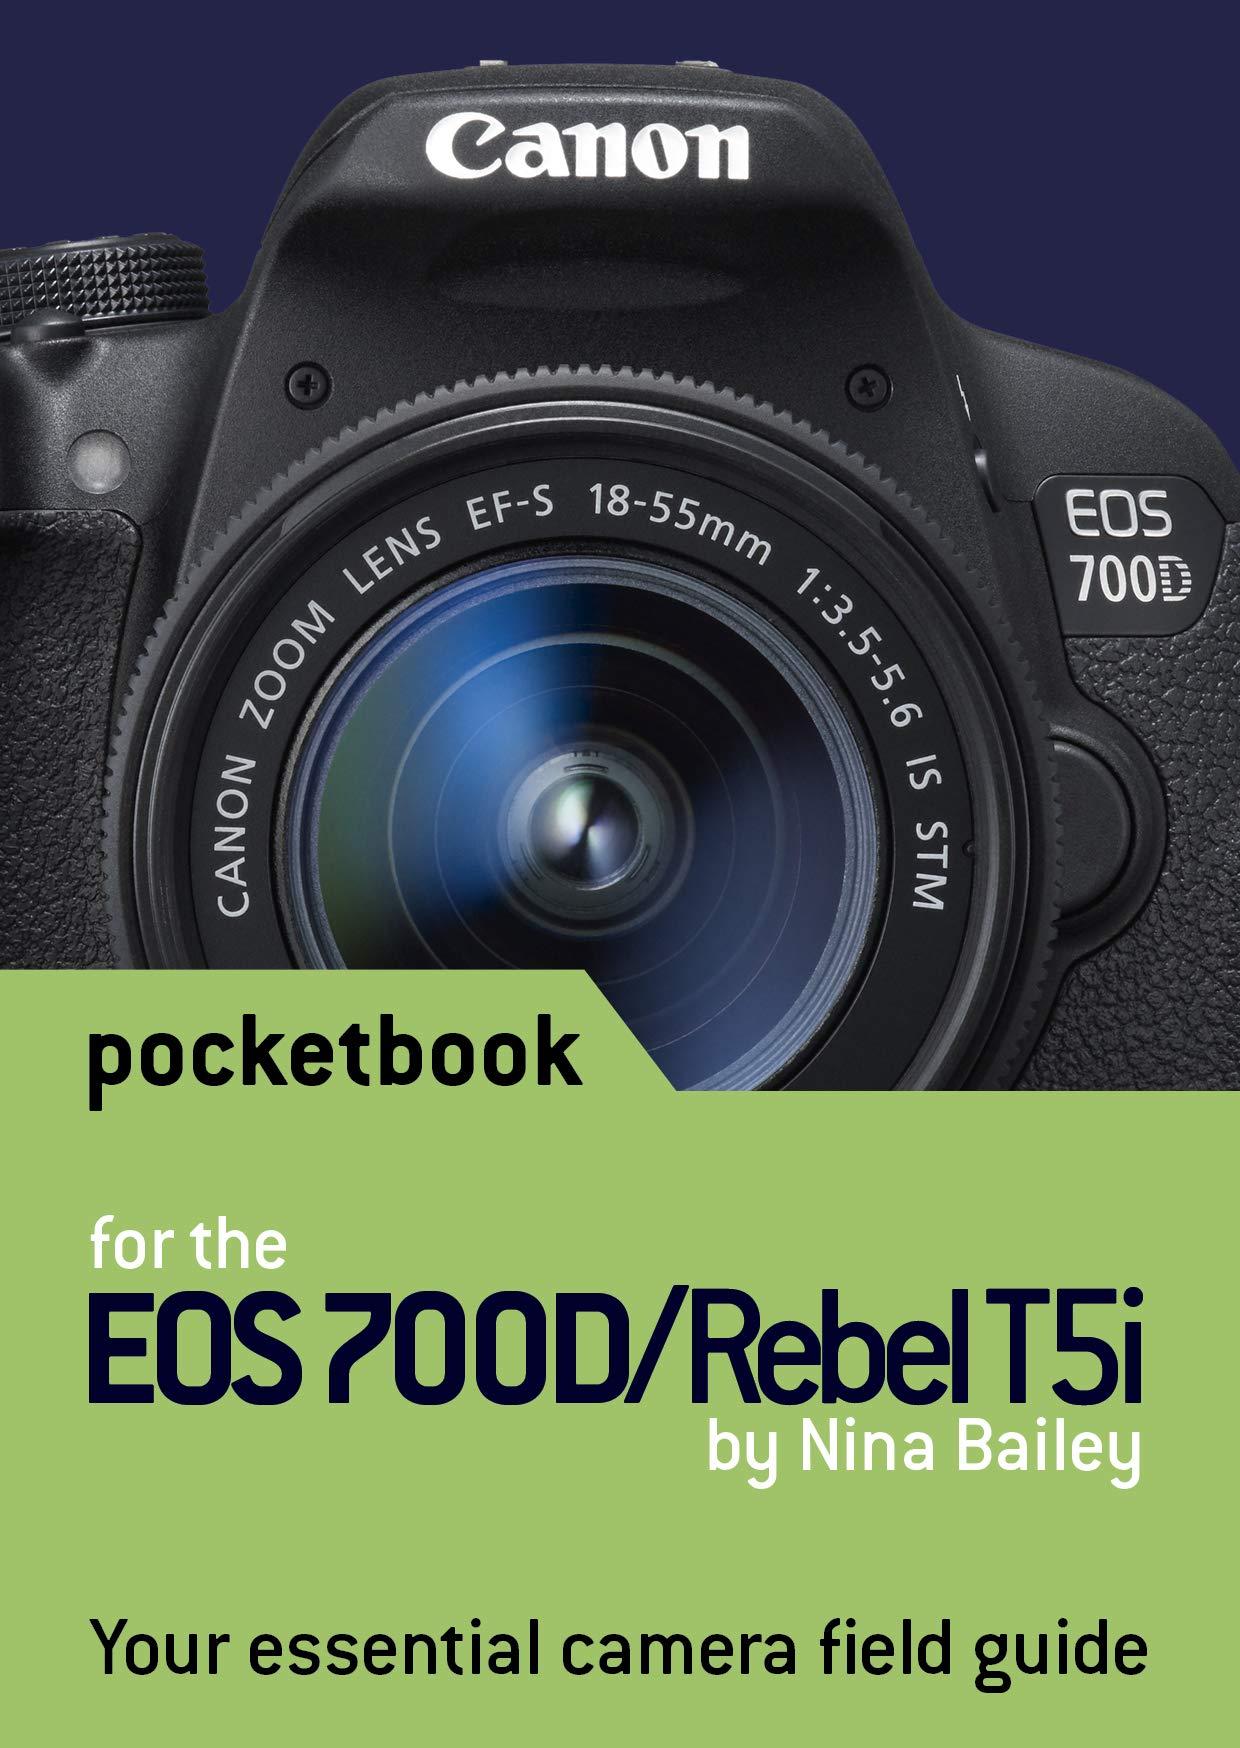 Canon EOS 700D / Rebel T5i Pocketbook: camera field guide: Amazon ...